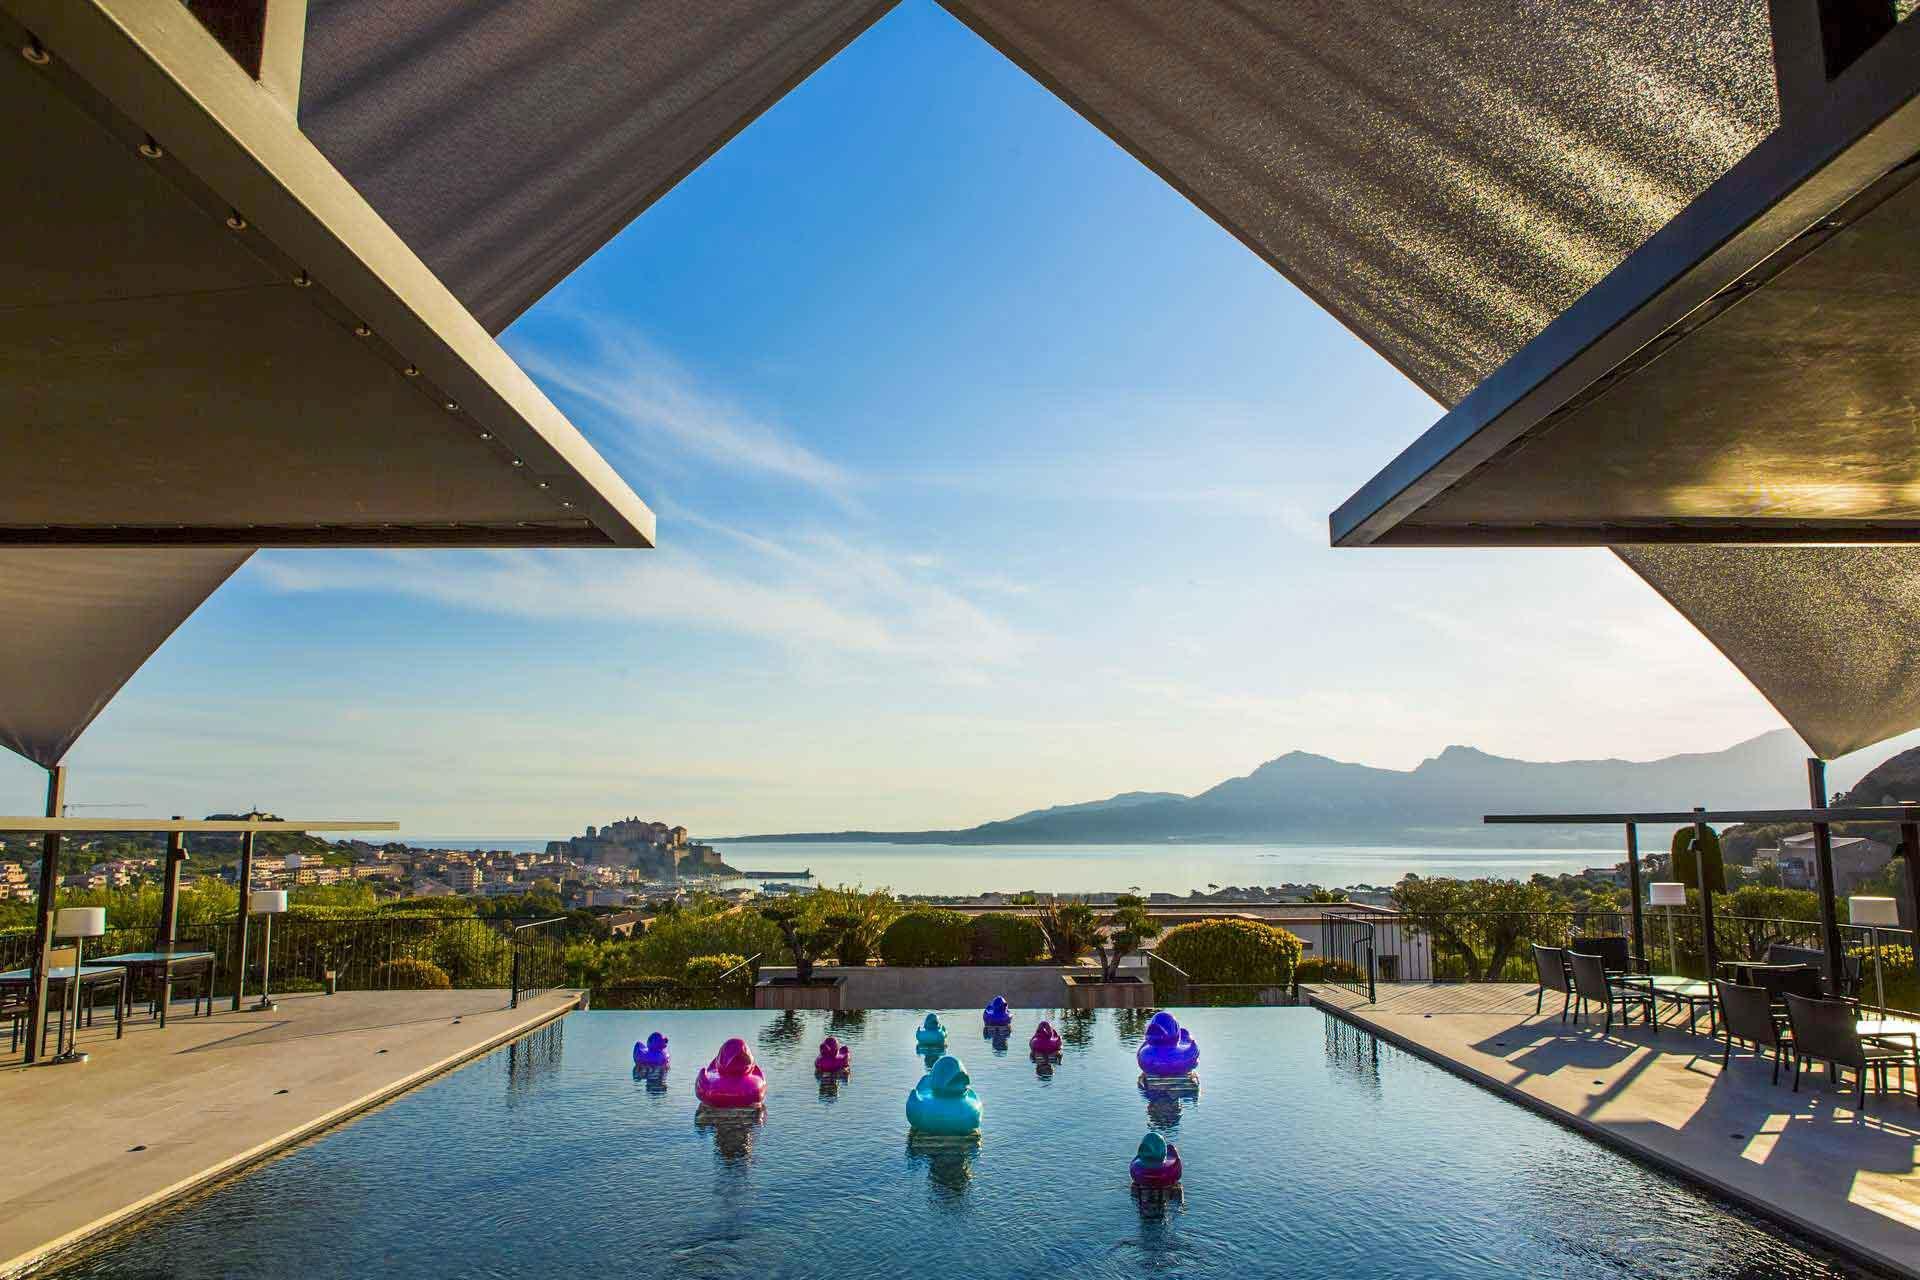 La piscine de La Villa domine la baie de Calvi © DR